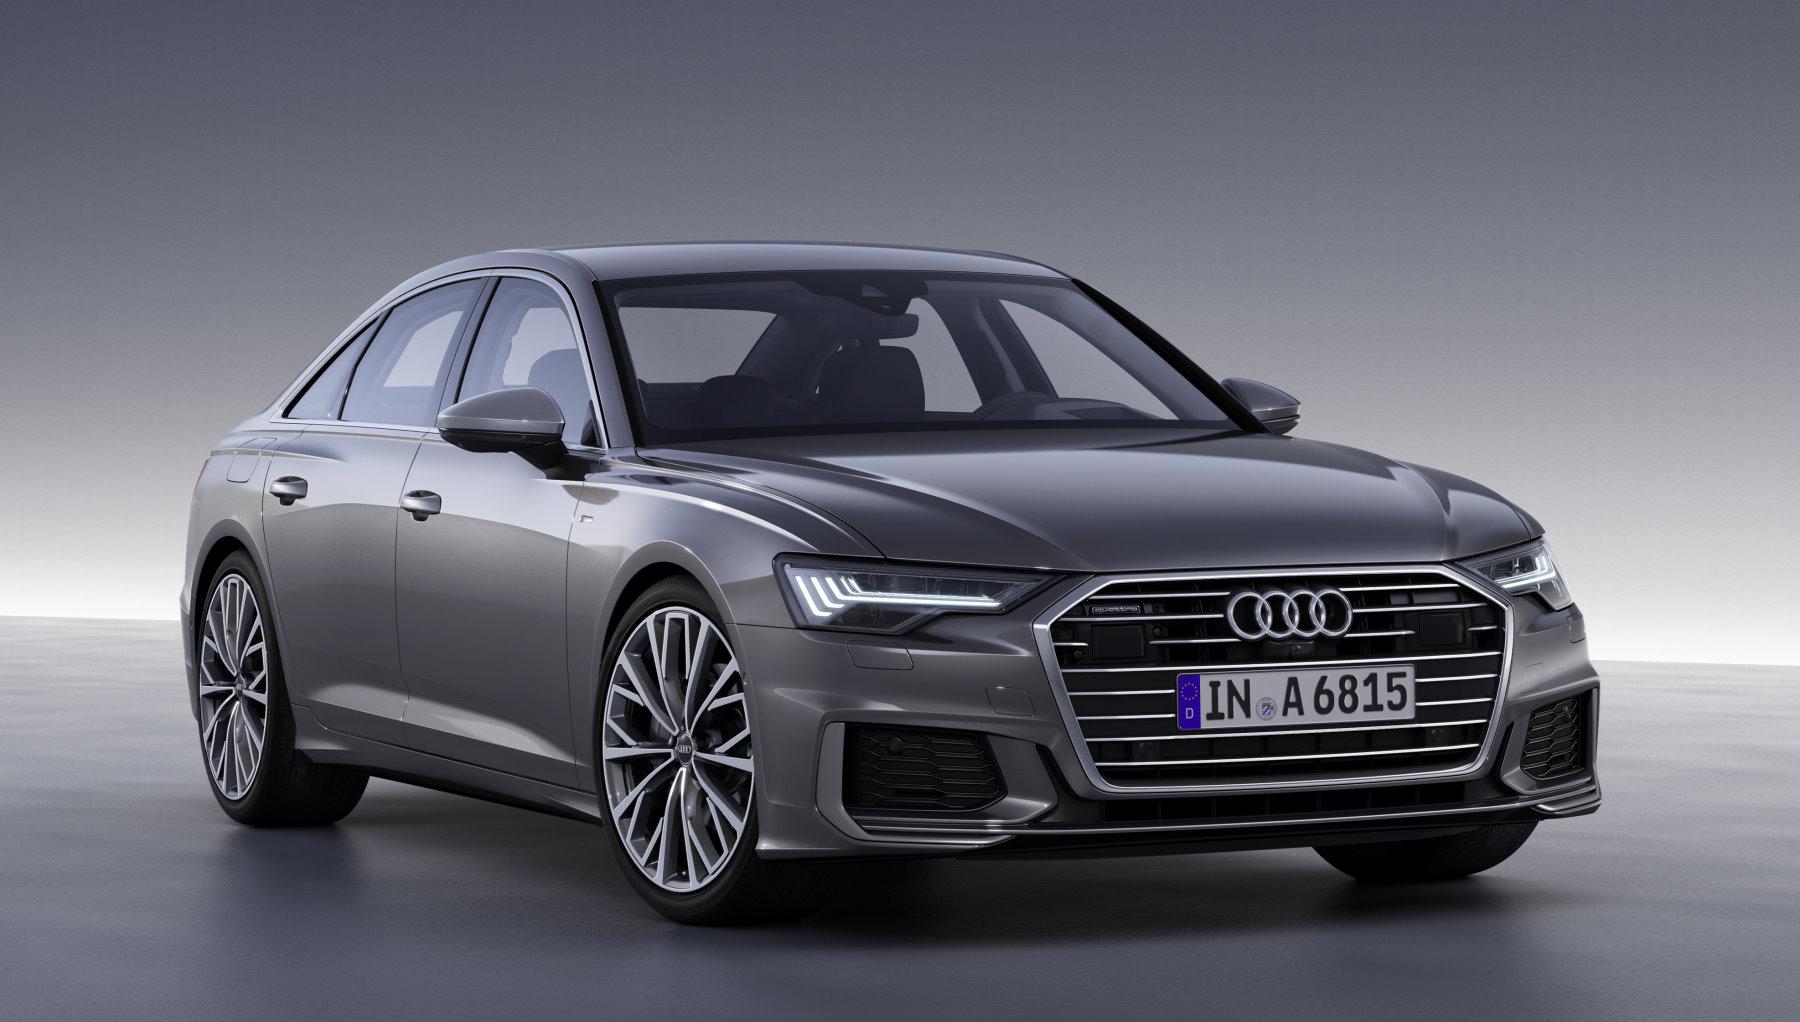 Neuer Audi A6 Aufholjagd Auf Den Klassenprimus